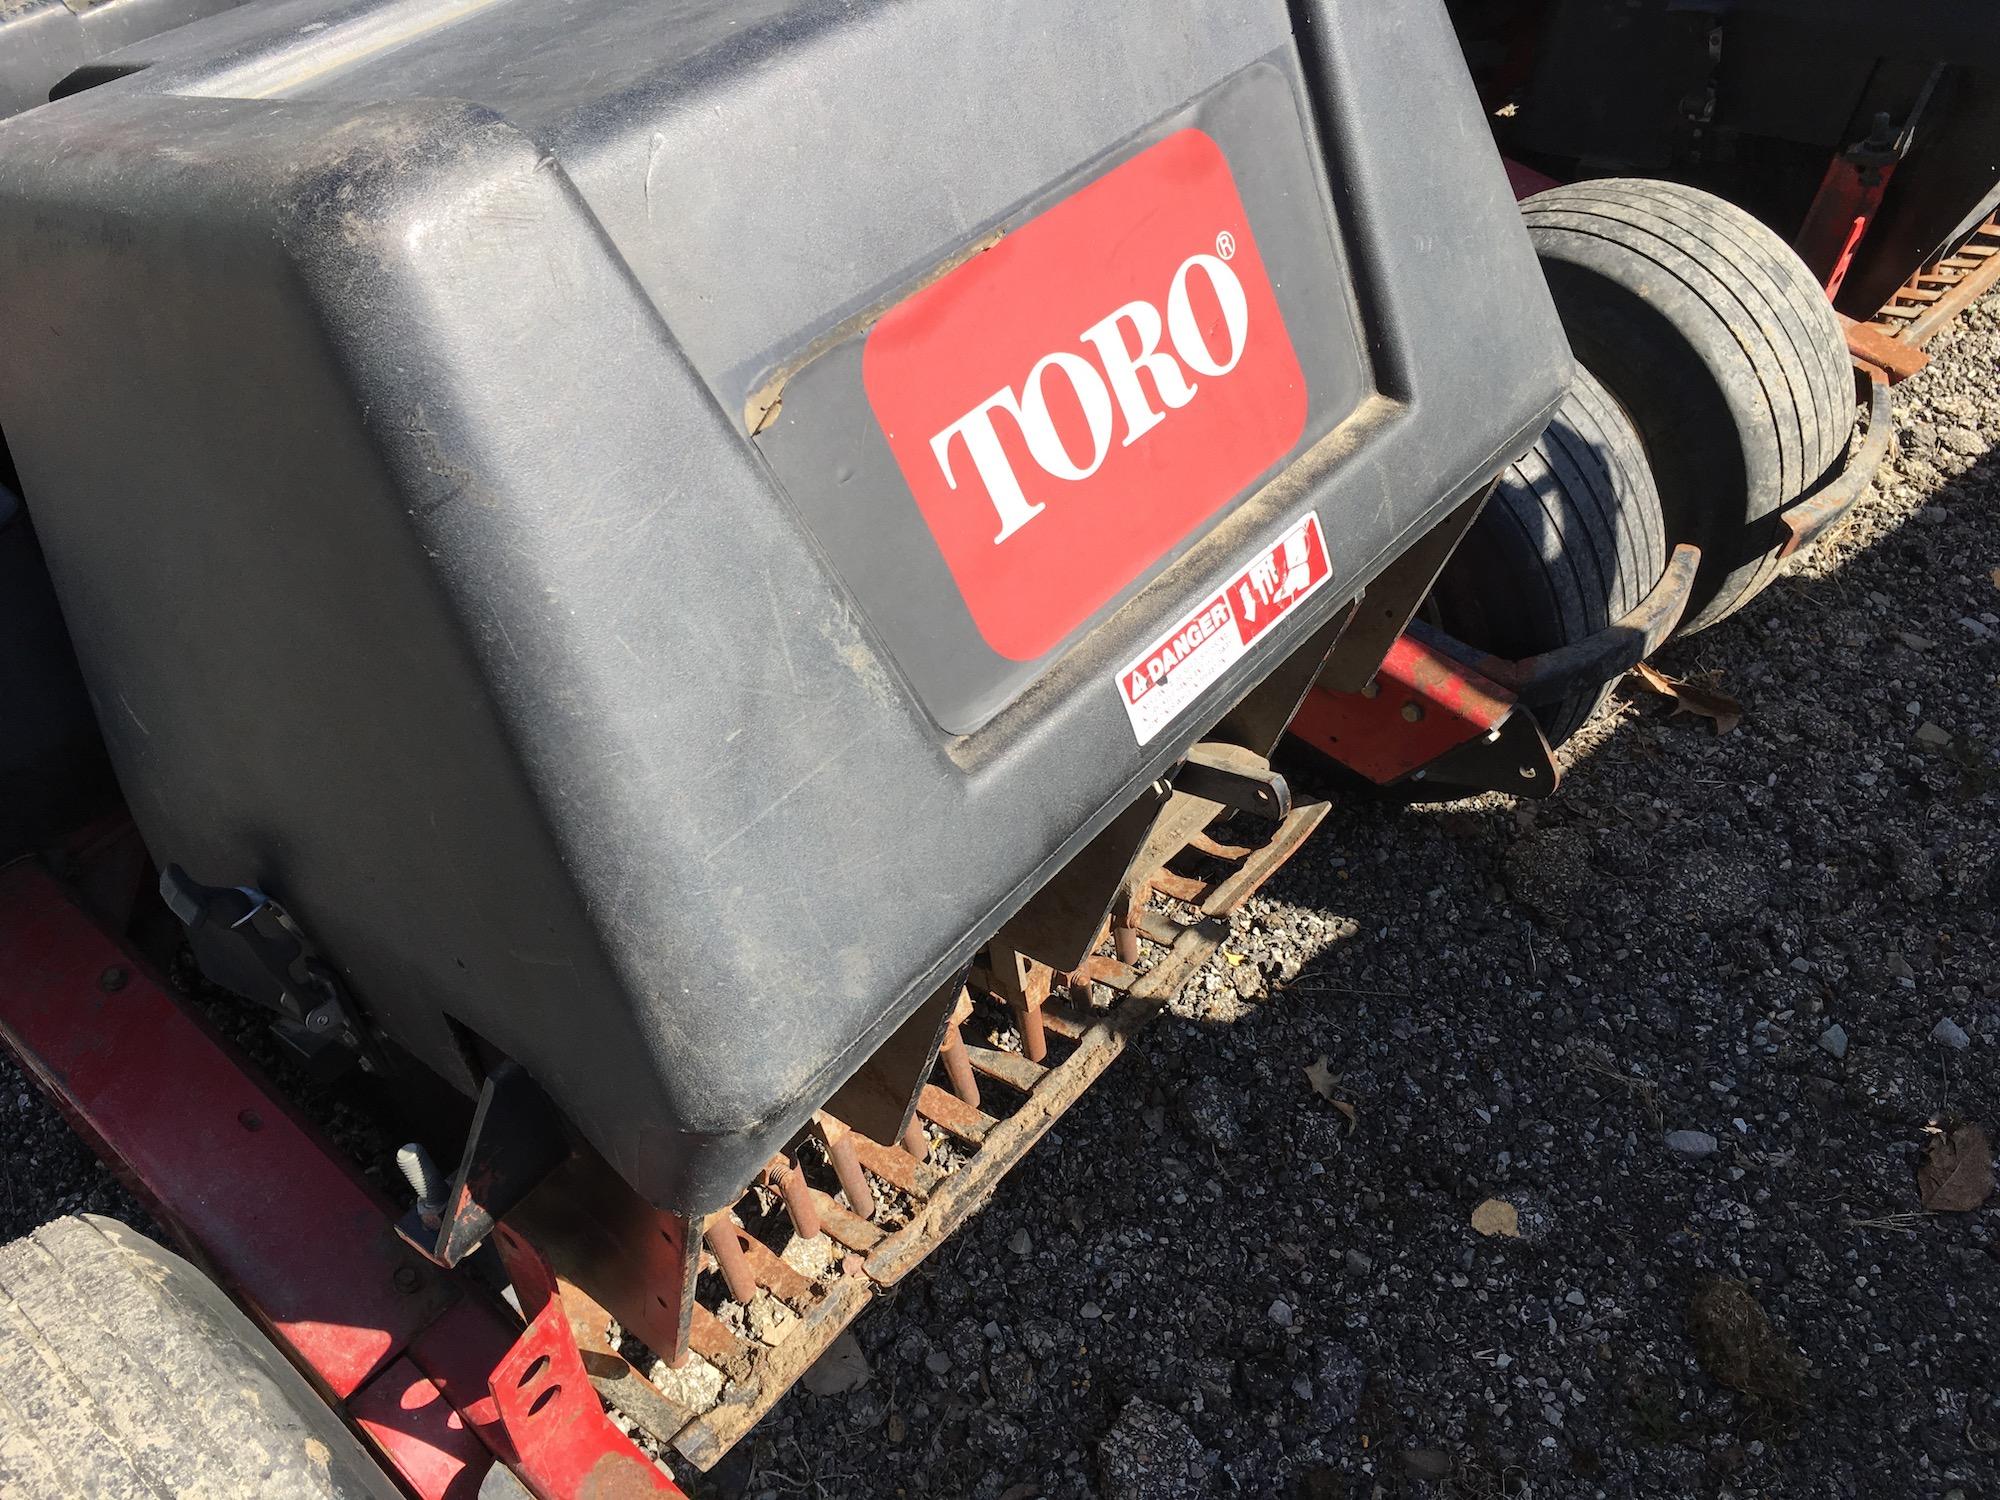 Toro-9110-GreensAerators-08